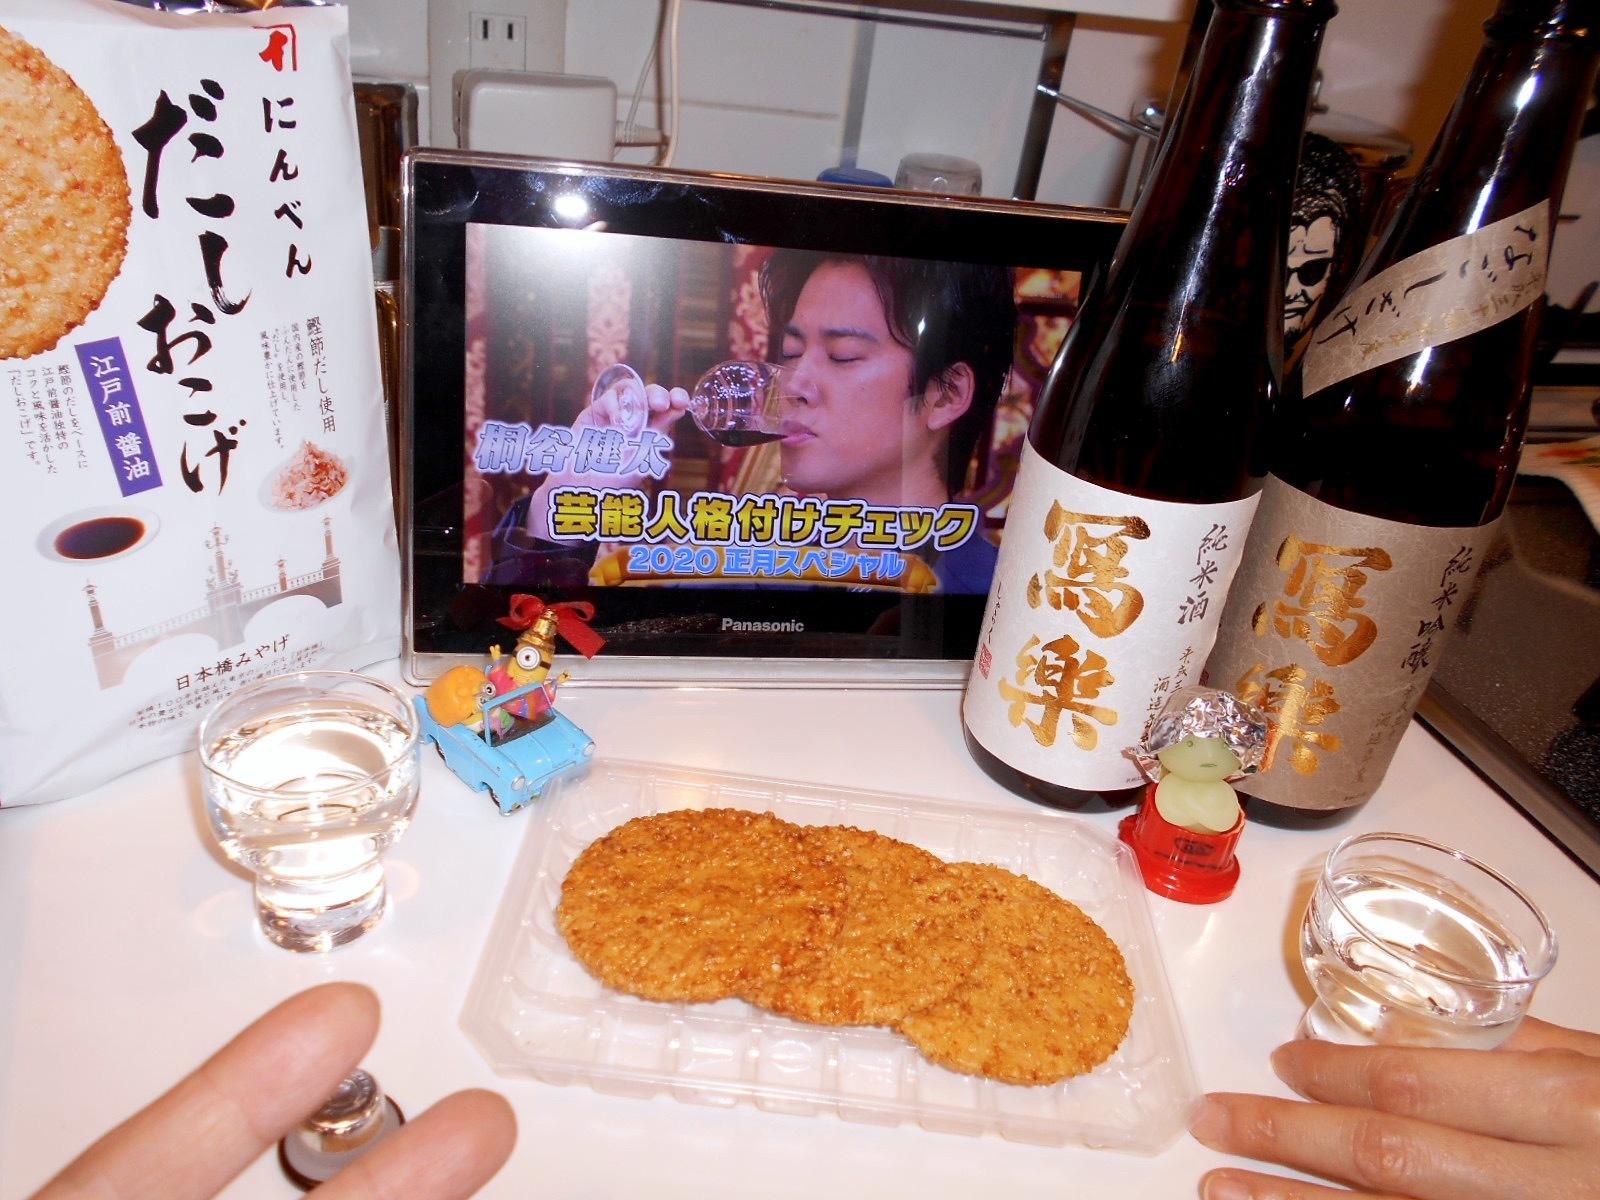 syaraku_junmai2018by3.jpg